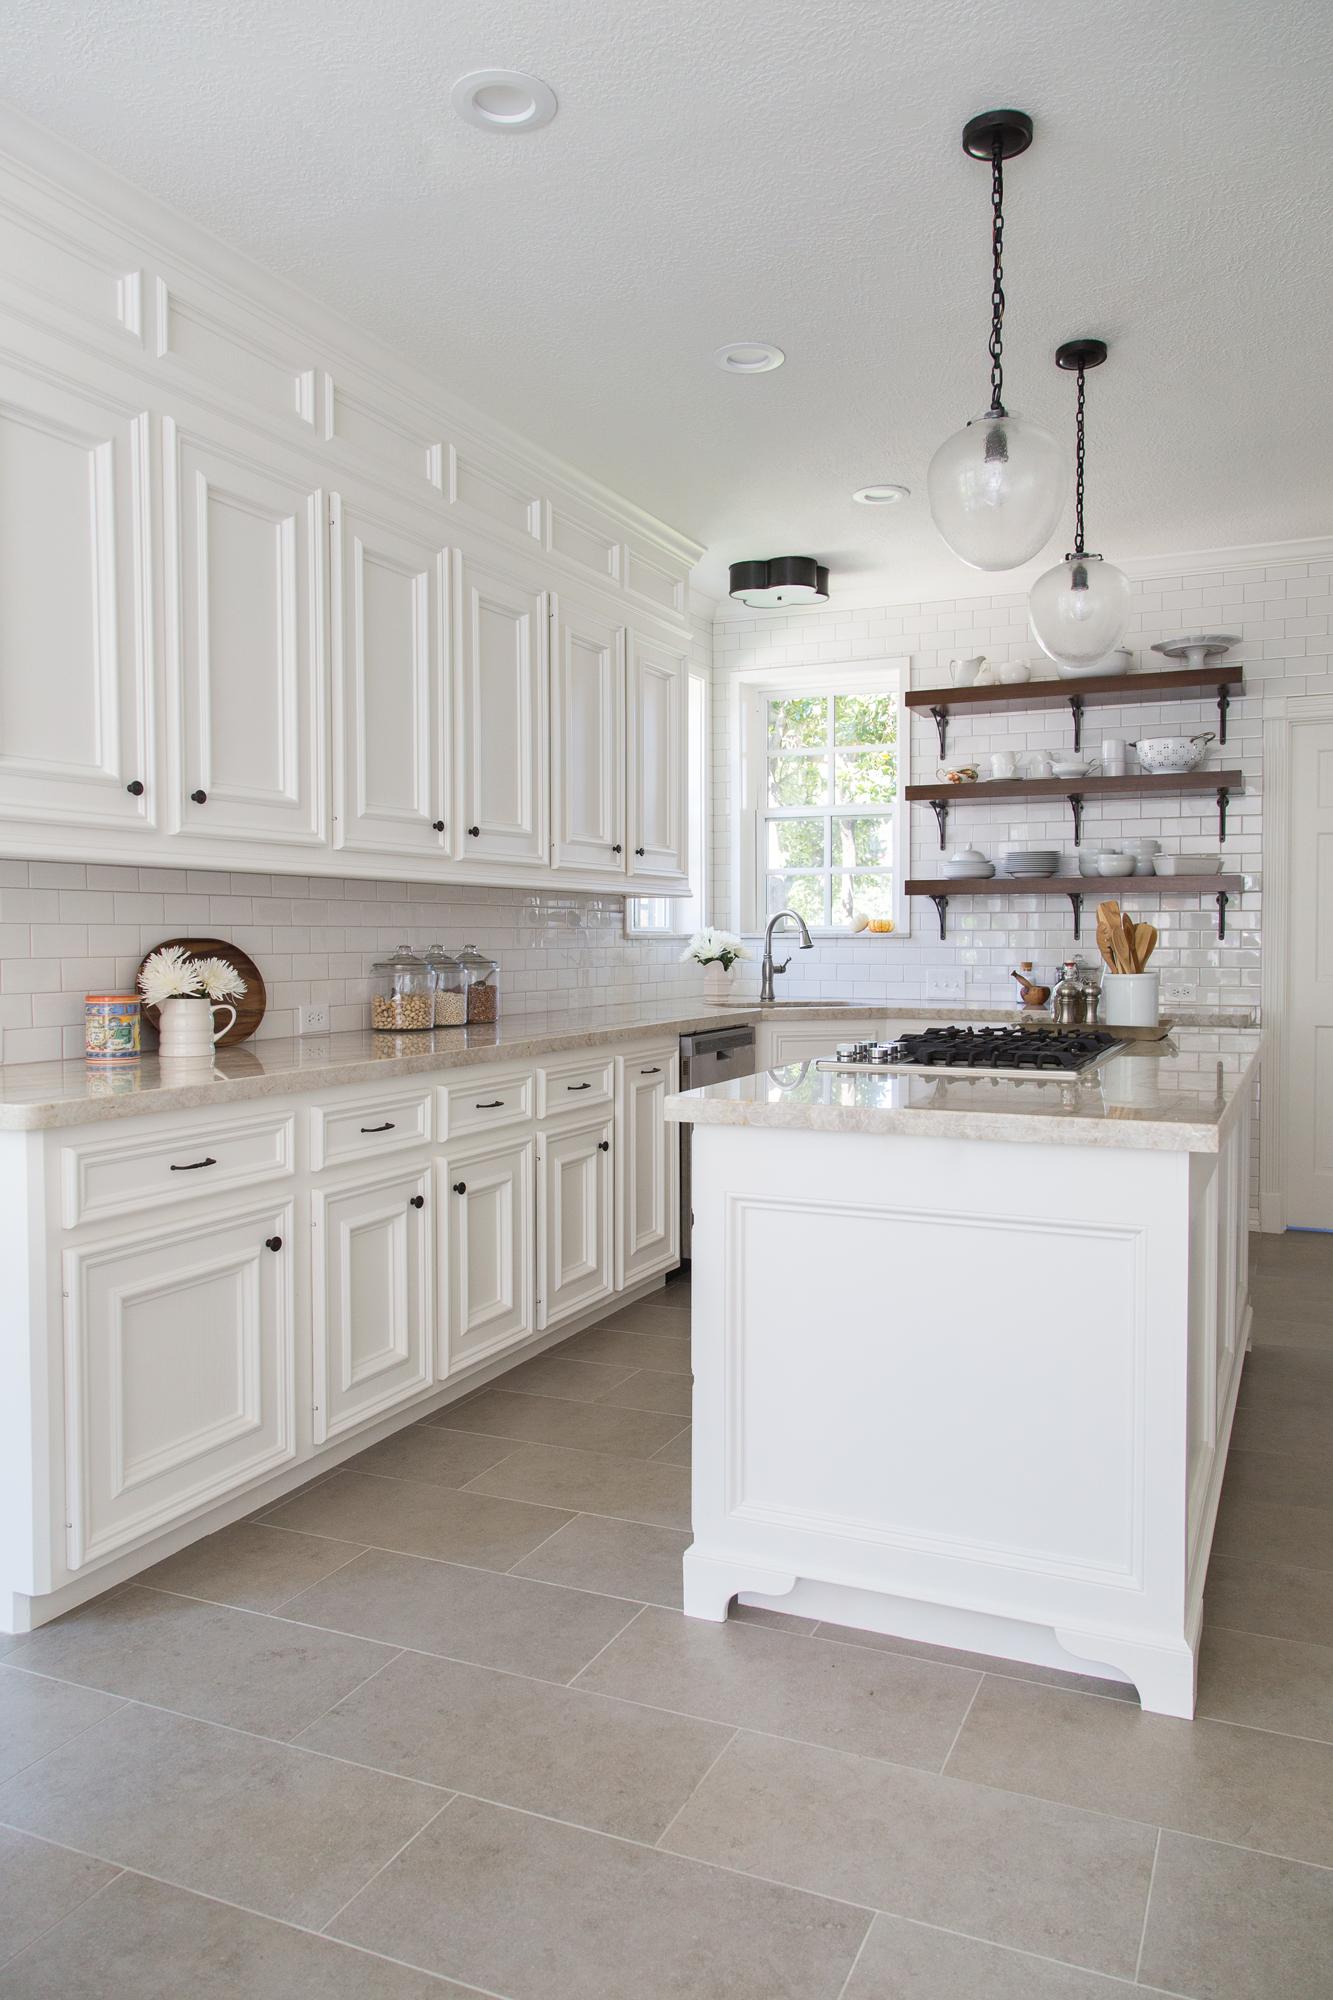 Farmhouse kitchen remodel | Interior Designer: Carla Aston | Photographer: Tori Aston